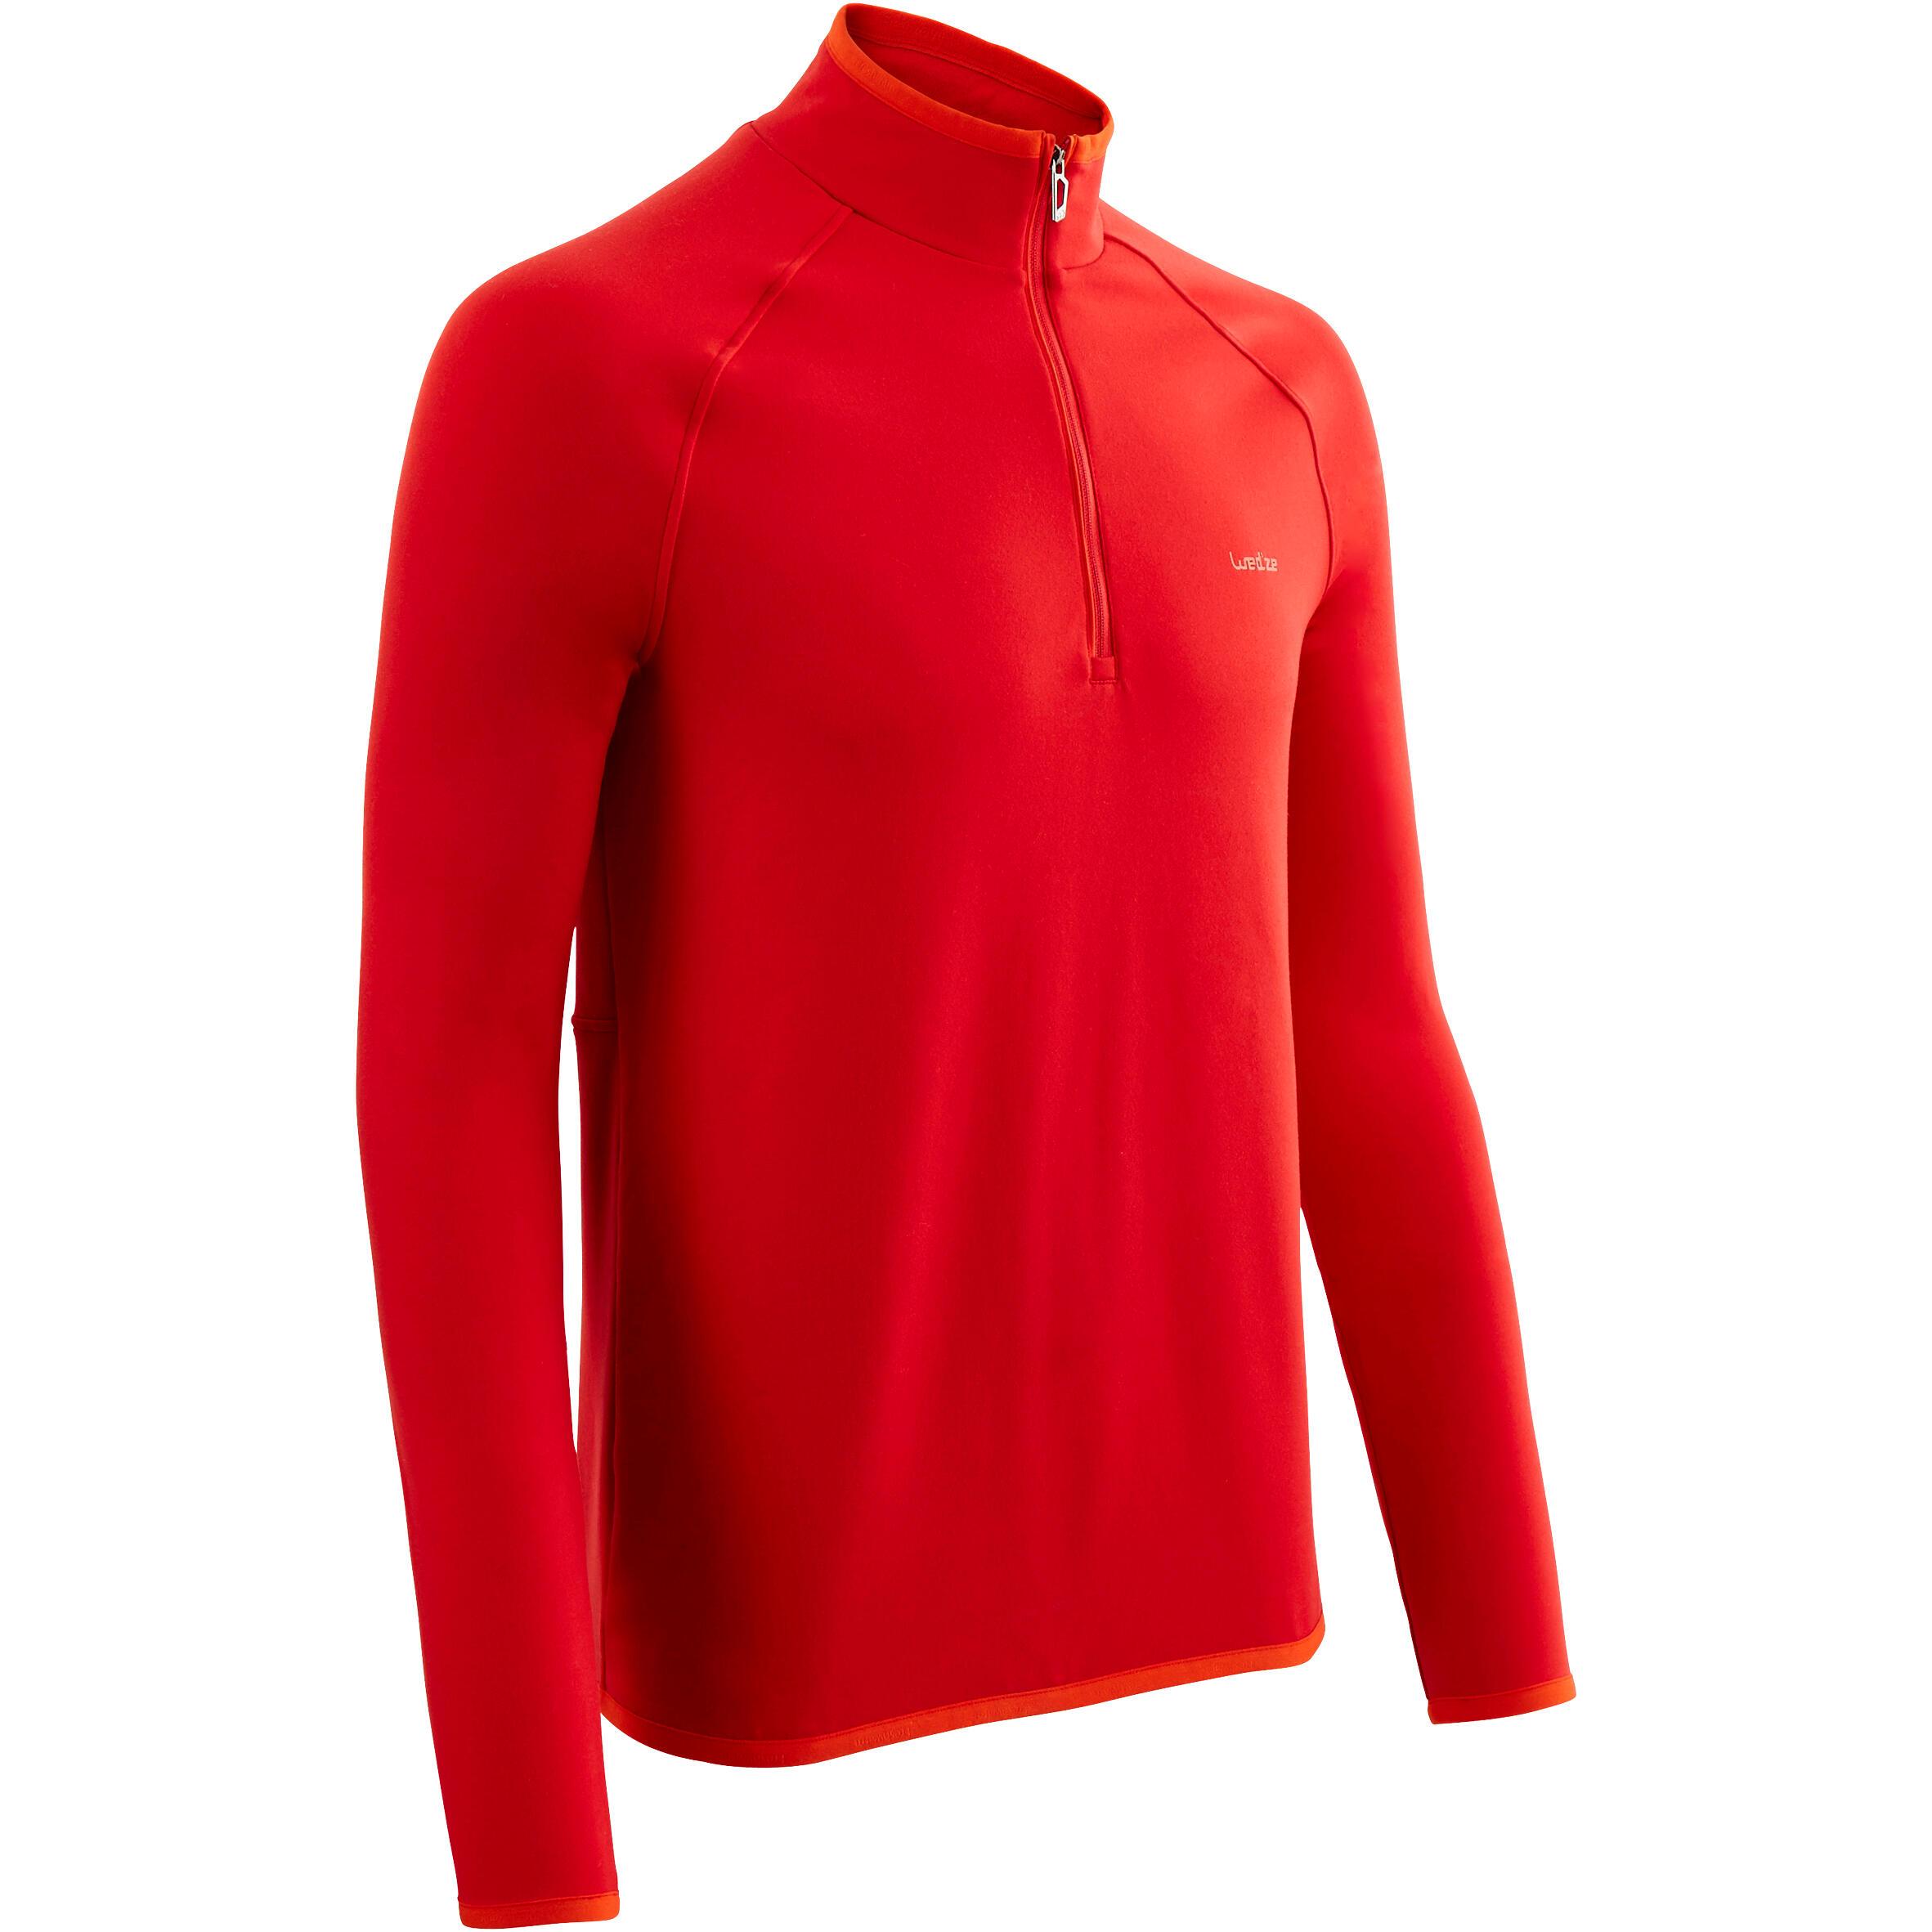 Wed'ze Skiondershirt voor heren Freshwarm 1/2 rits rood thumbnail